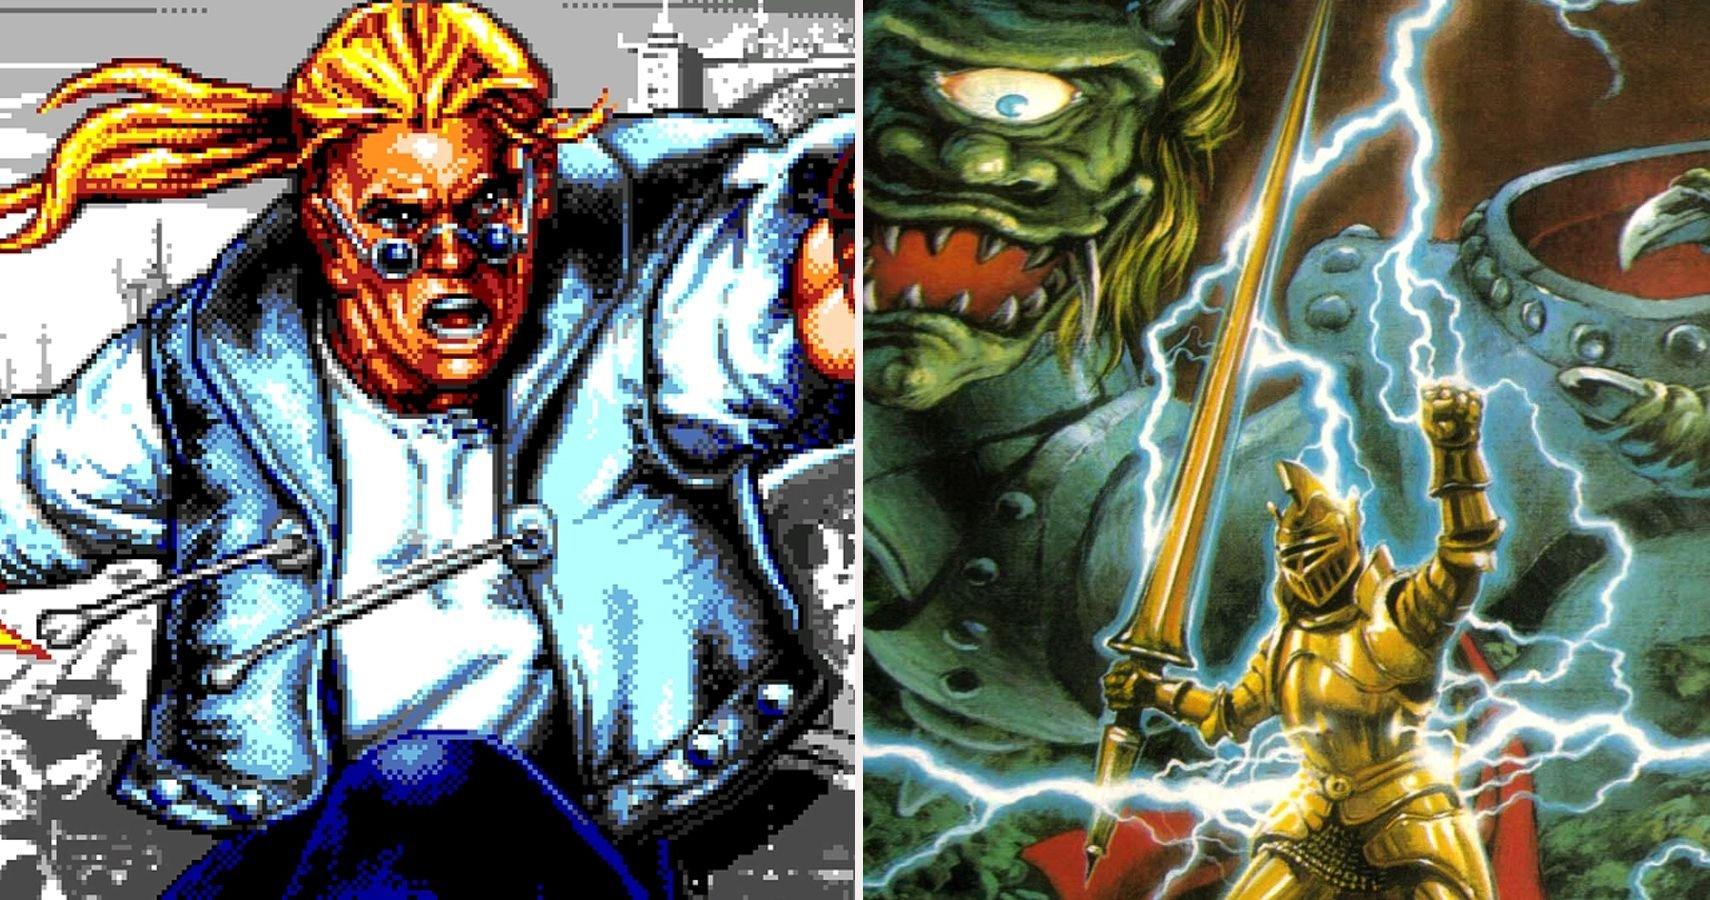 10 Sega Genesis Games That Should Get A Remake